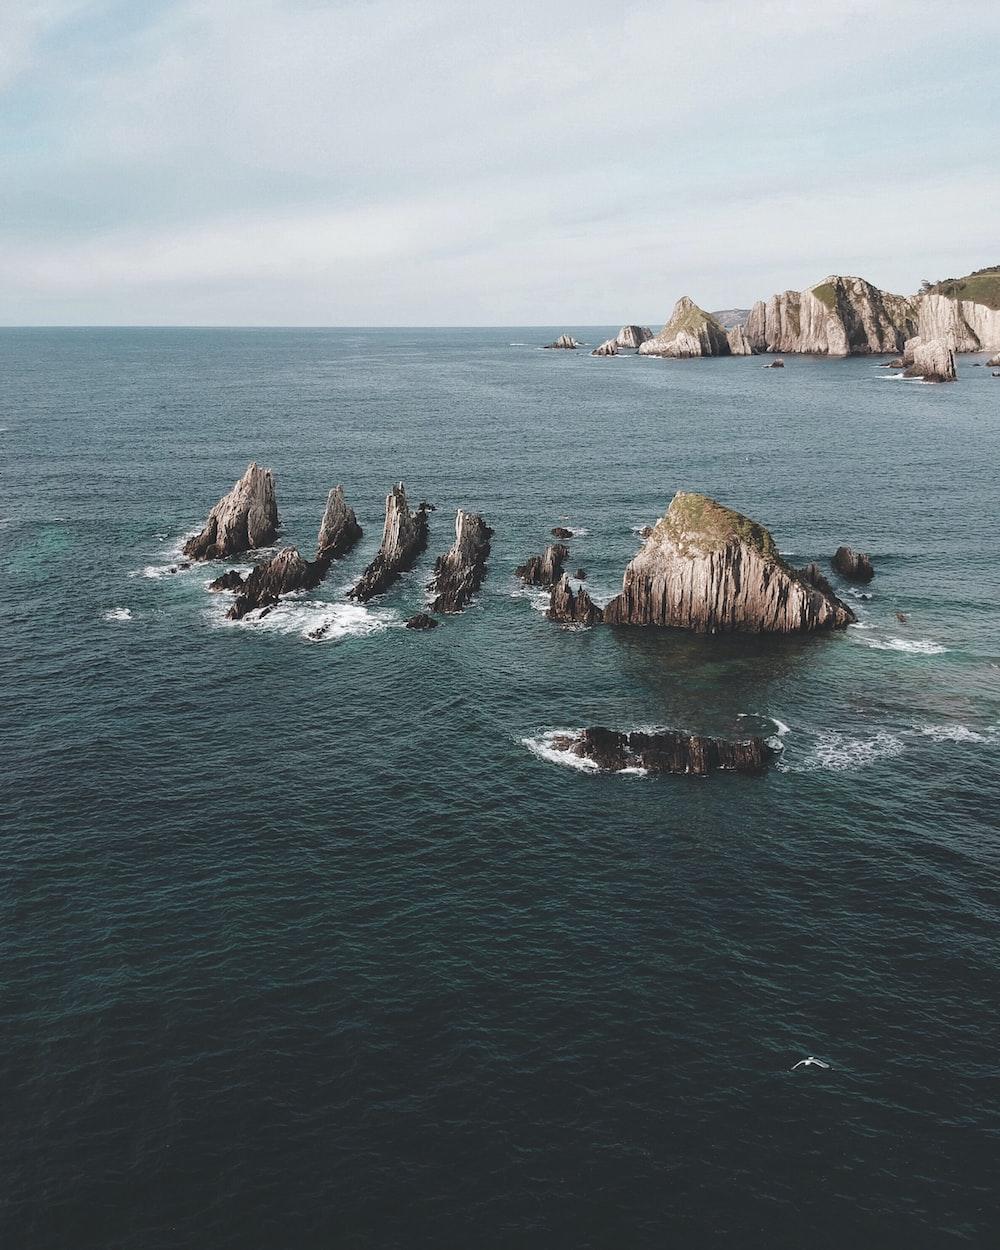 brown rock in the middle of ocean